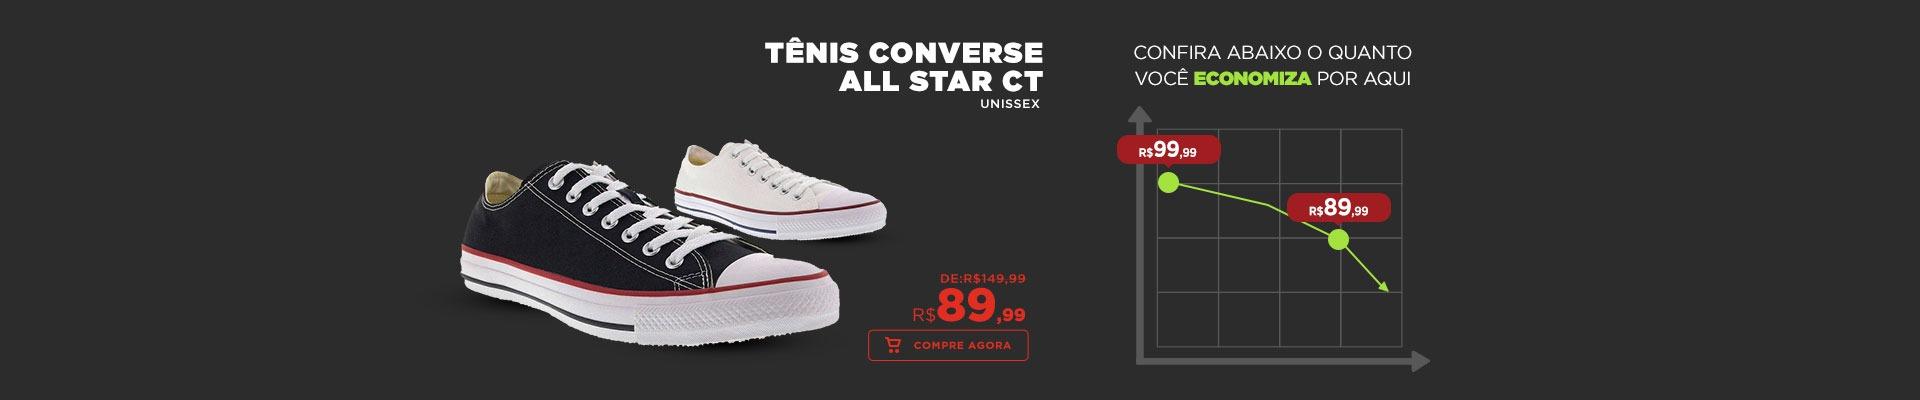 Tênis Converse All Star CT - Unissex